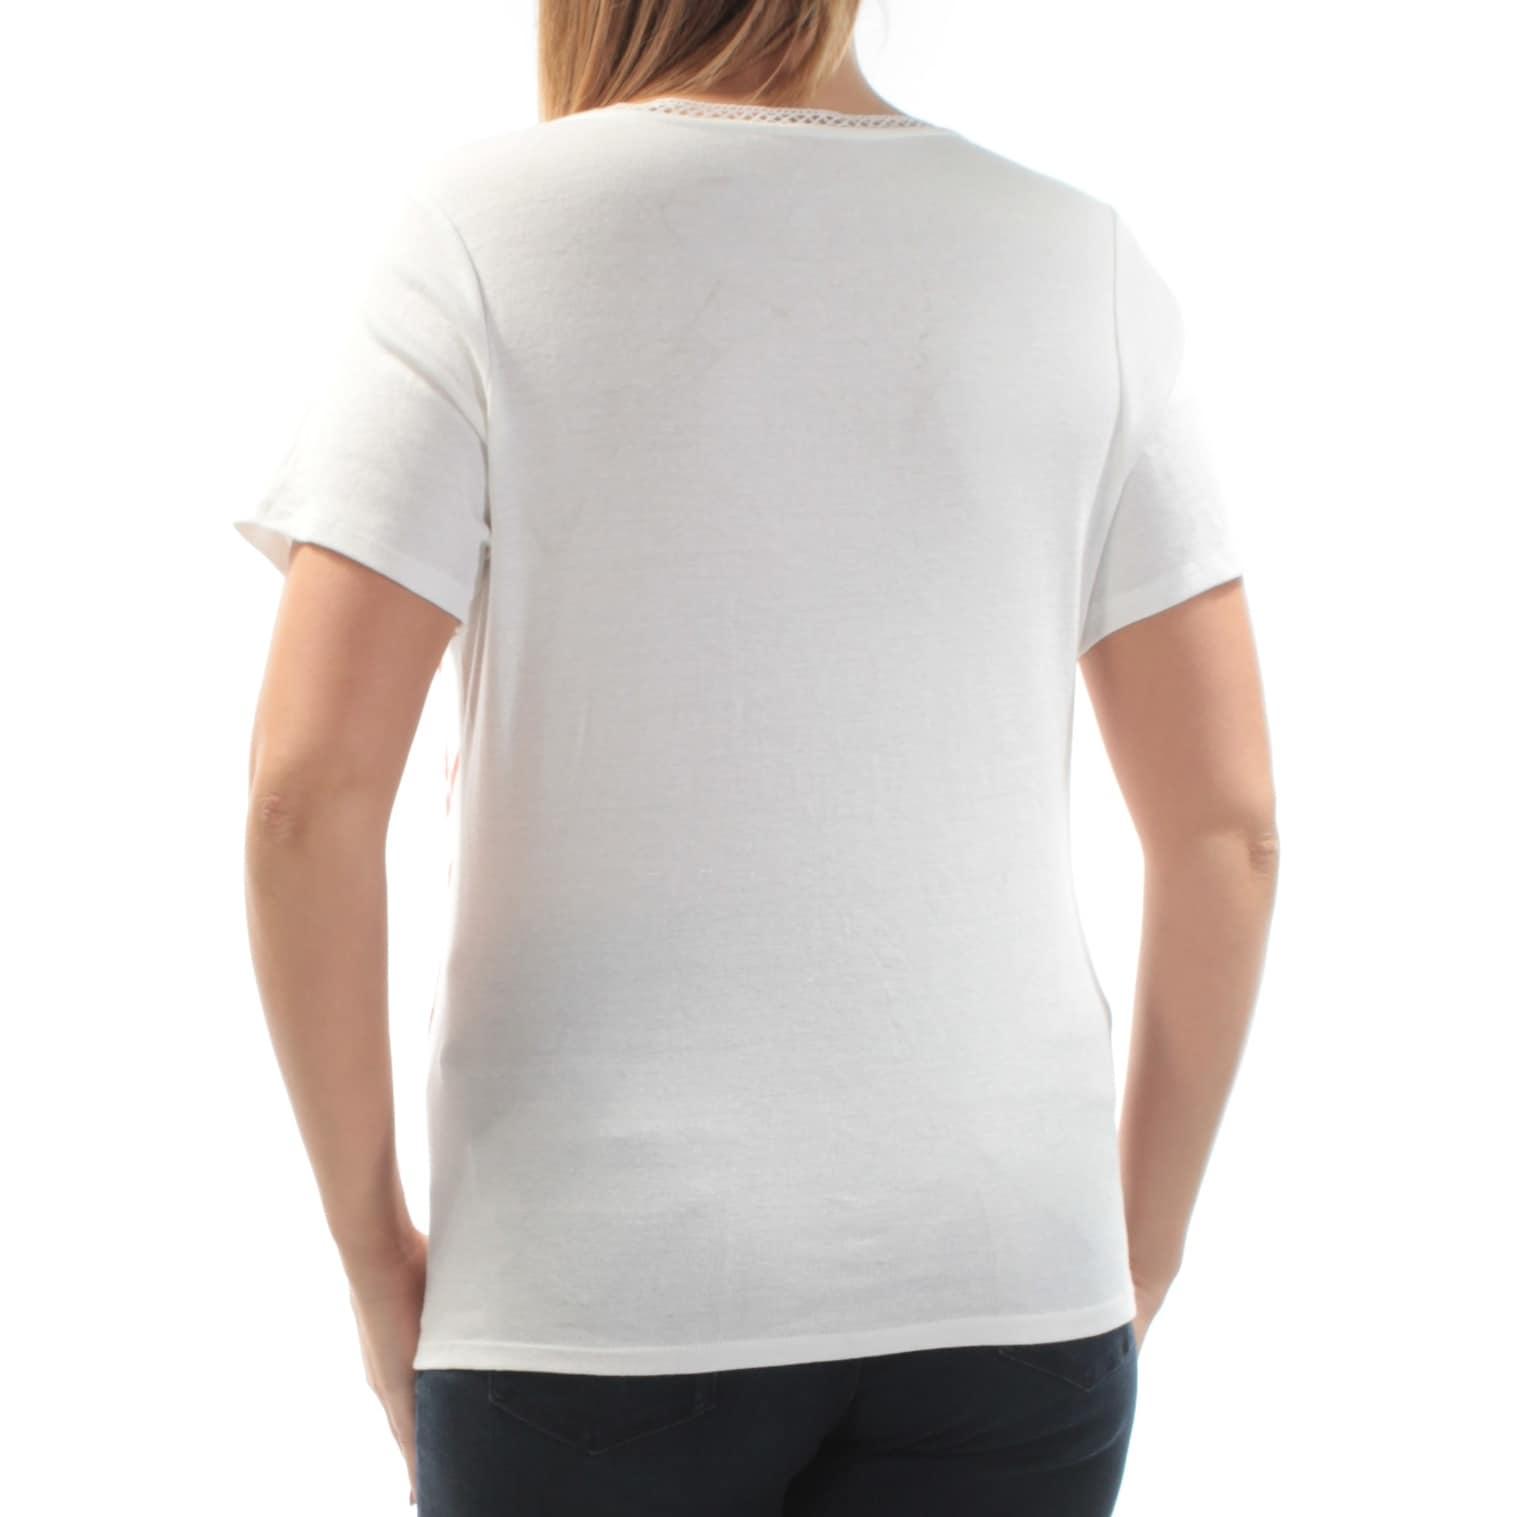 be987b510 Wellcoda Photographer Women V-Neck T-shirt NEW T-Shirts Tops